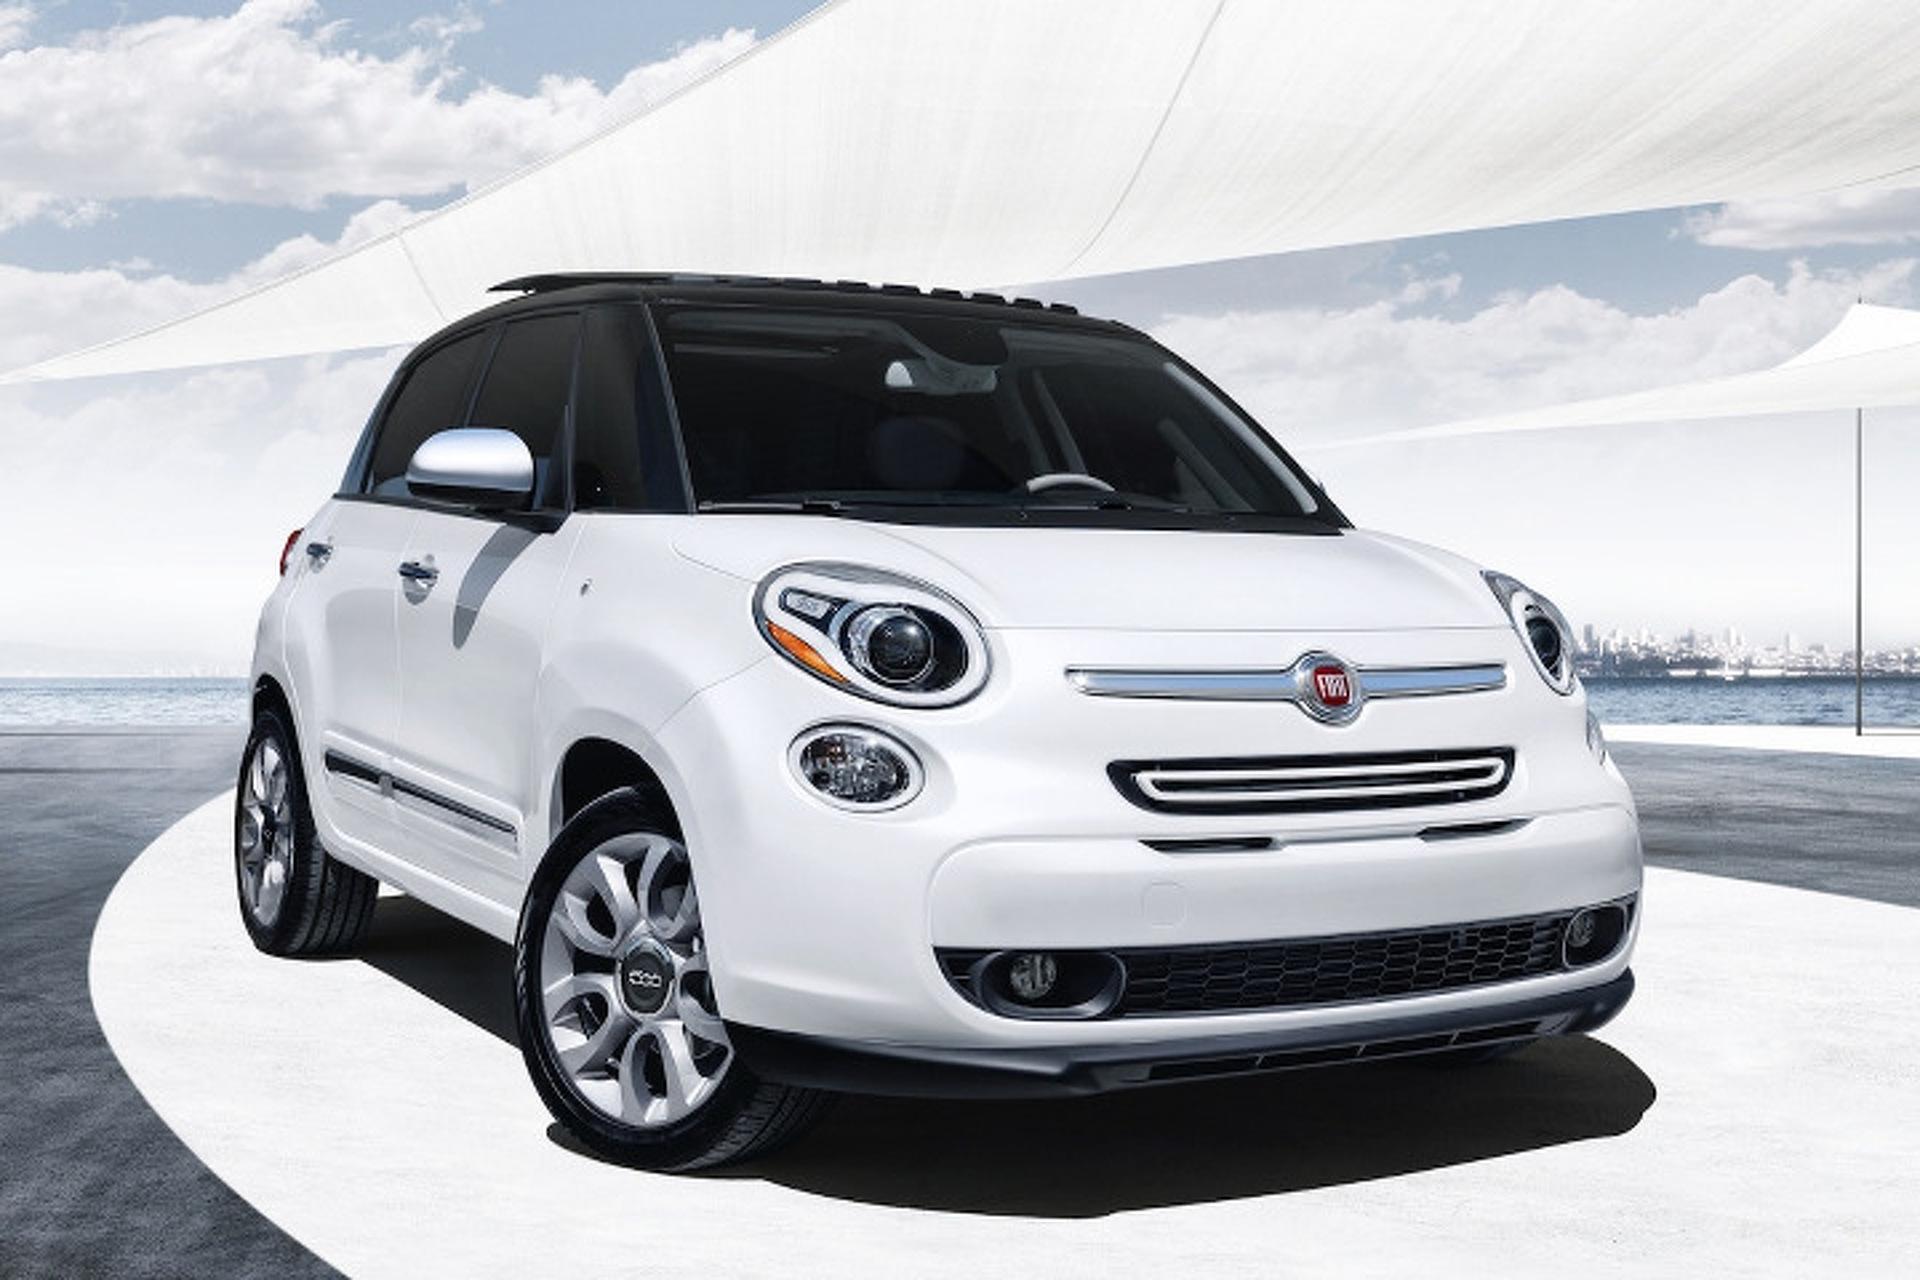 Fiat-Chrysler Moving Global HQ to London